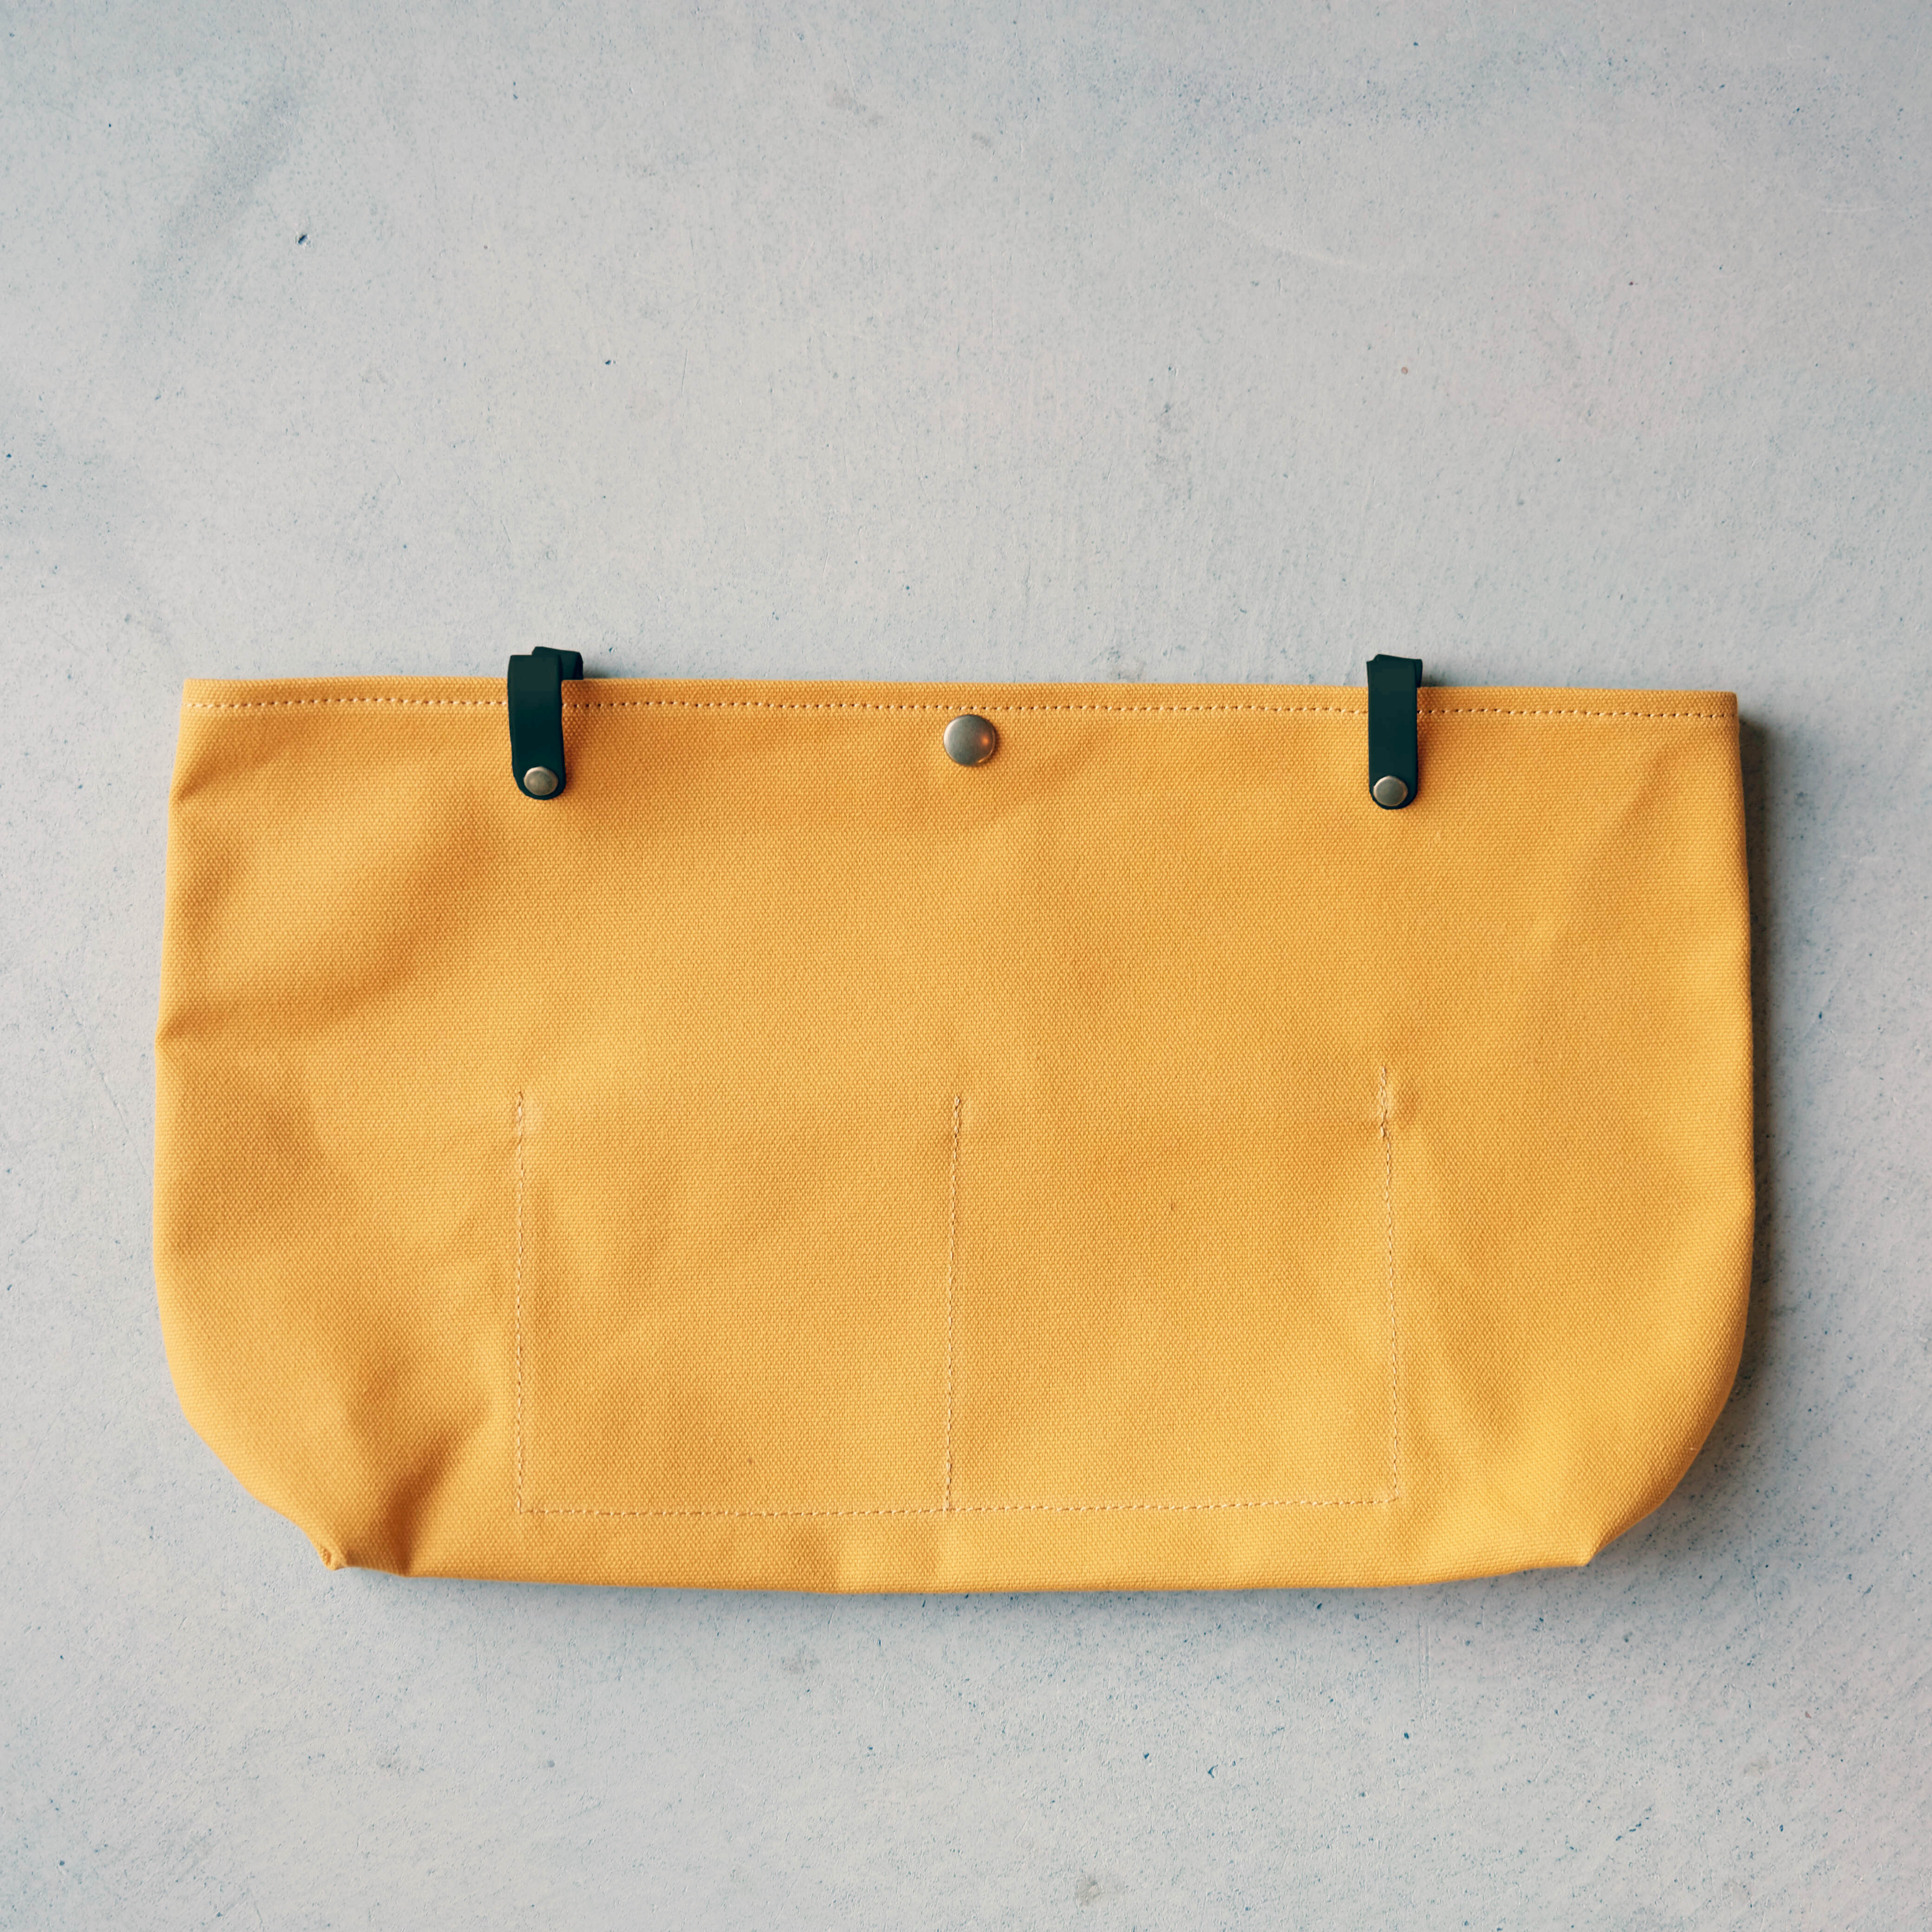 RIGHE用インナーバッグ 〈 Yellow 〉